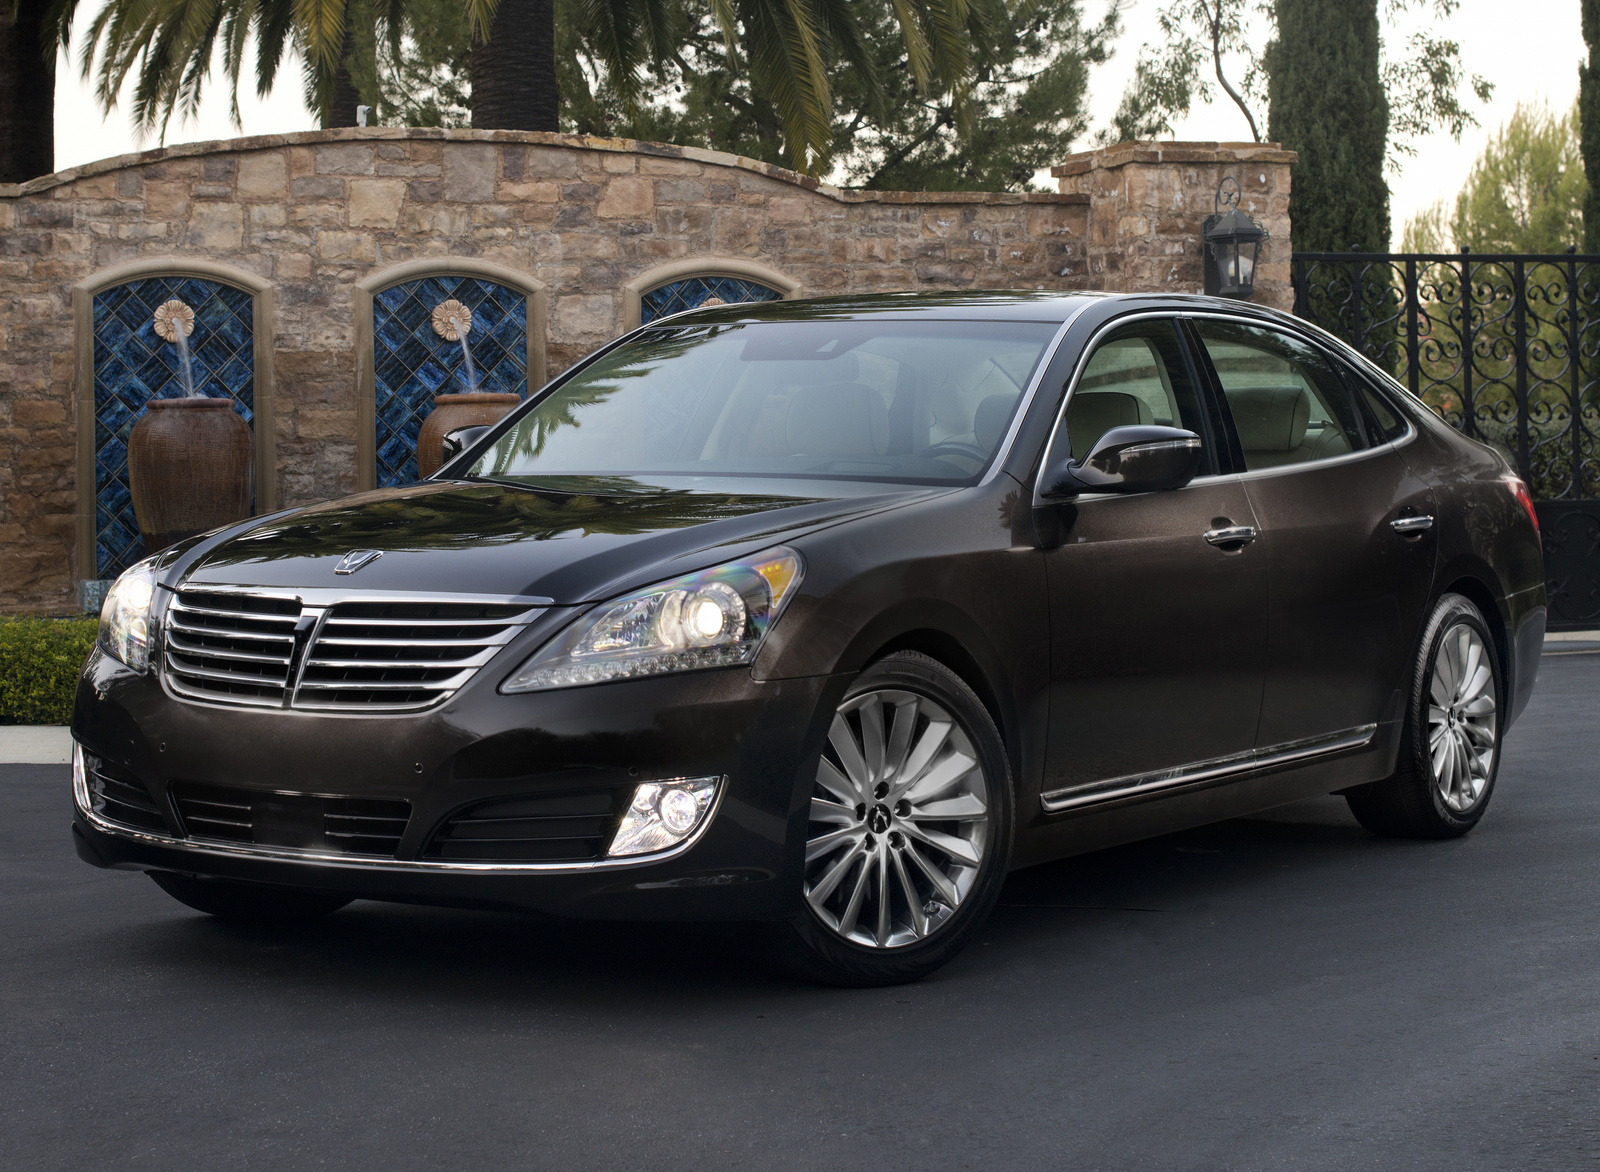 Car Equus (Hyundai): manufacturer, specifications, configuration, reviews 83